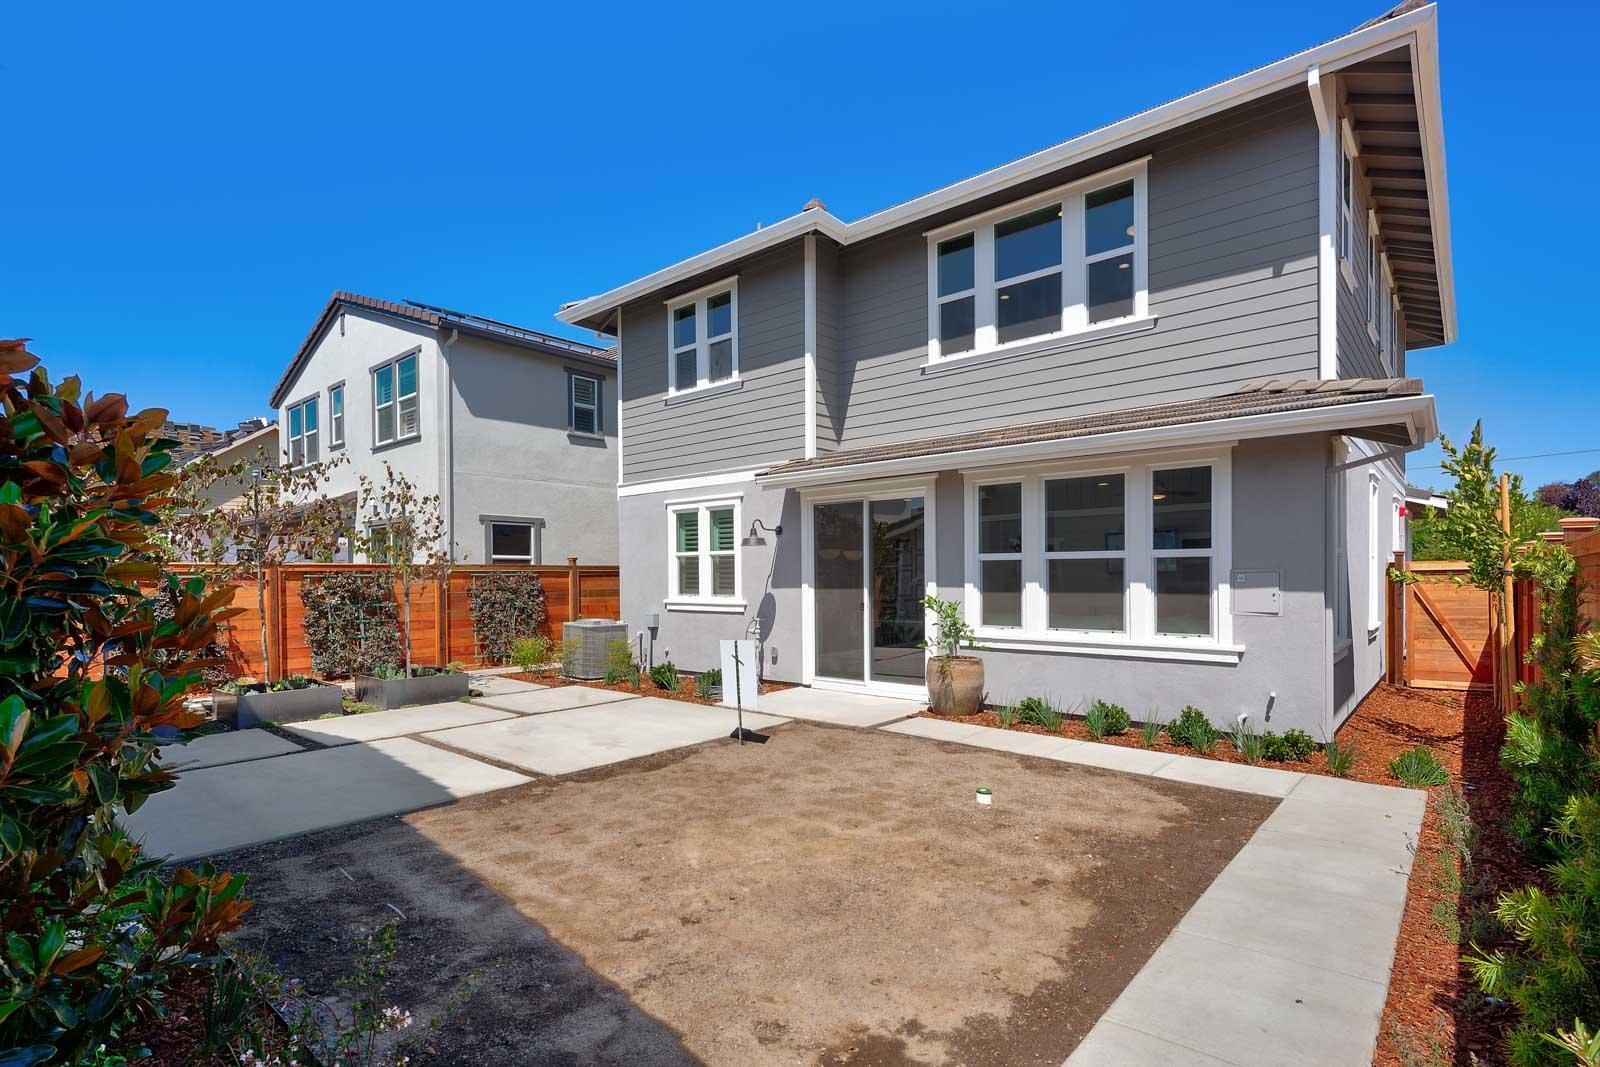 Residence 4 Backyard